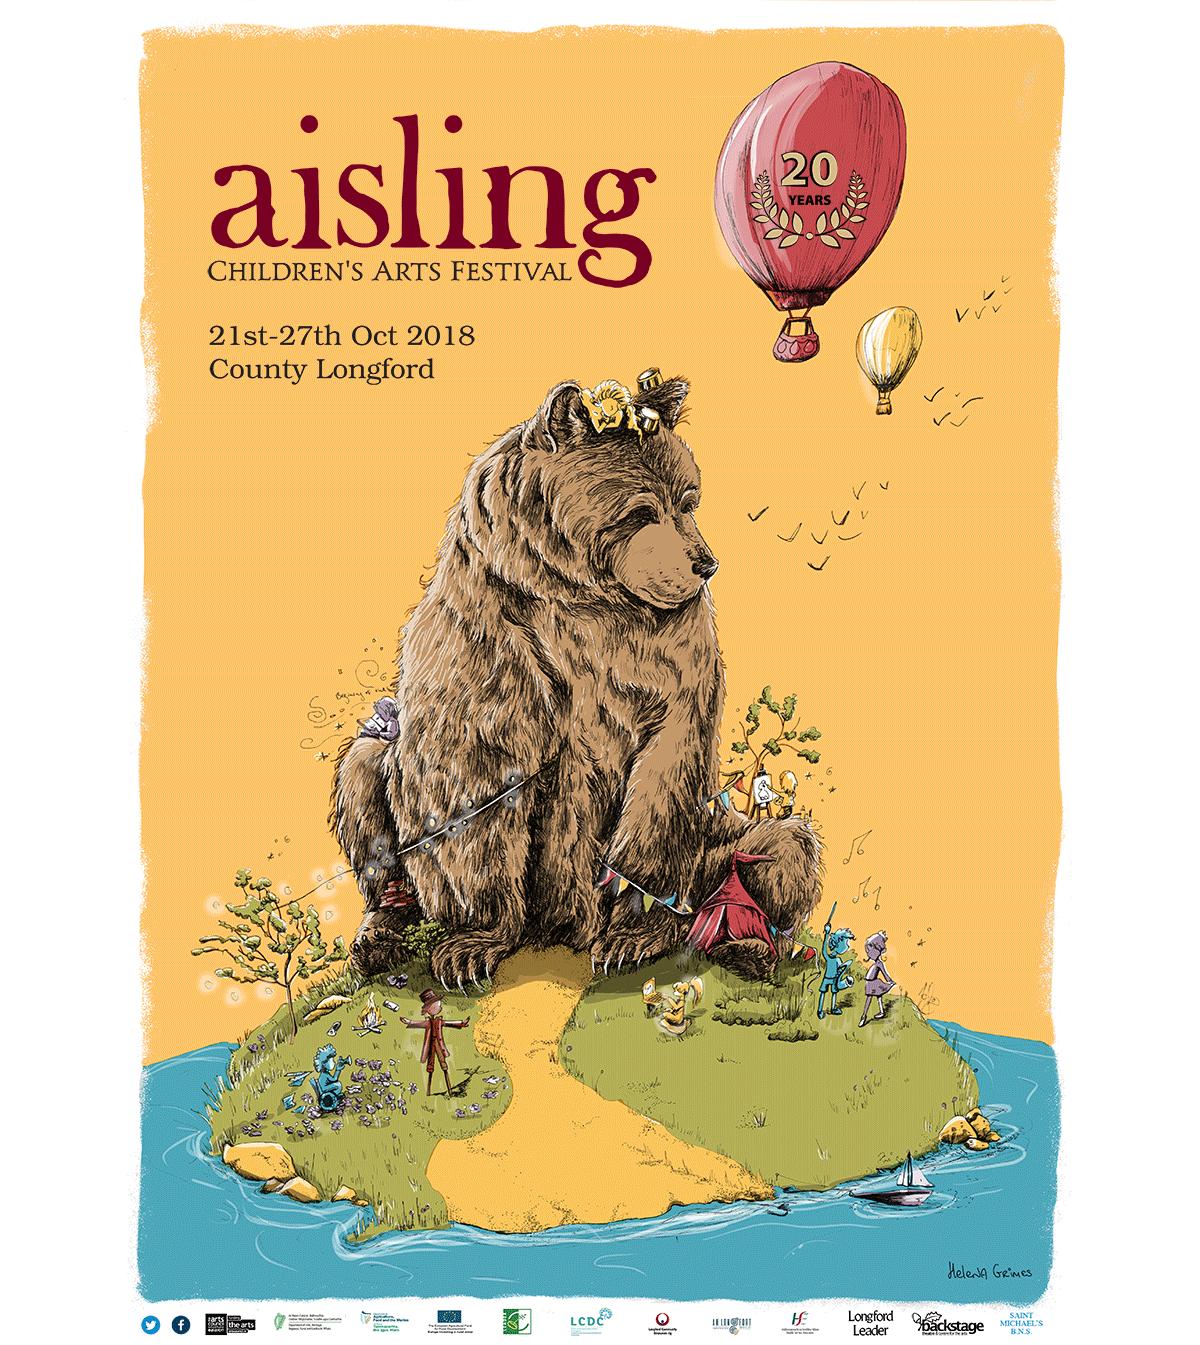 aisling-2018-3_helenagrimes.png